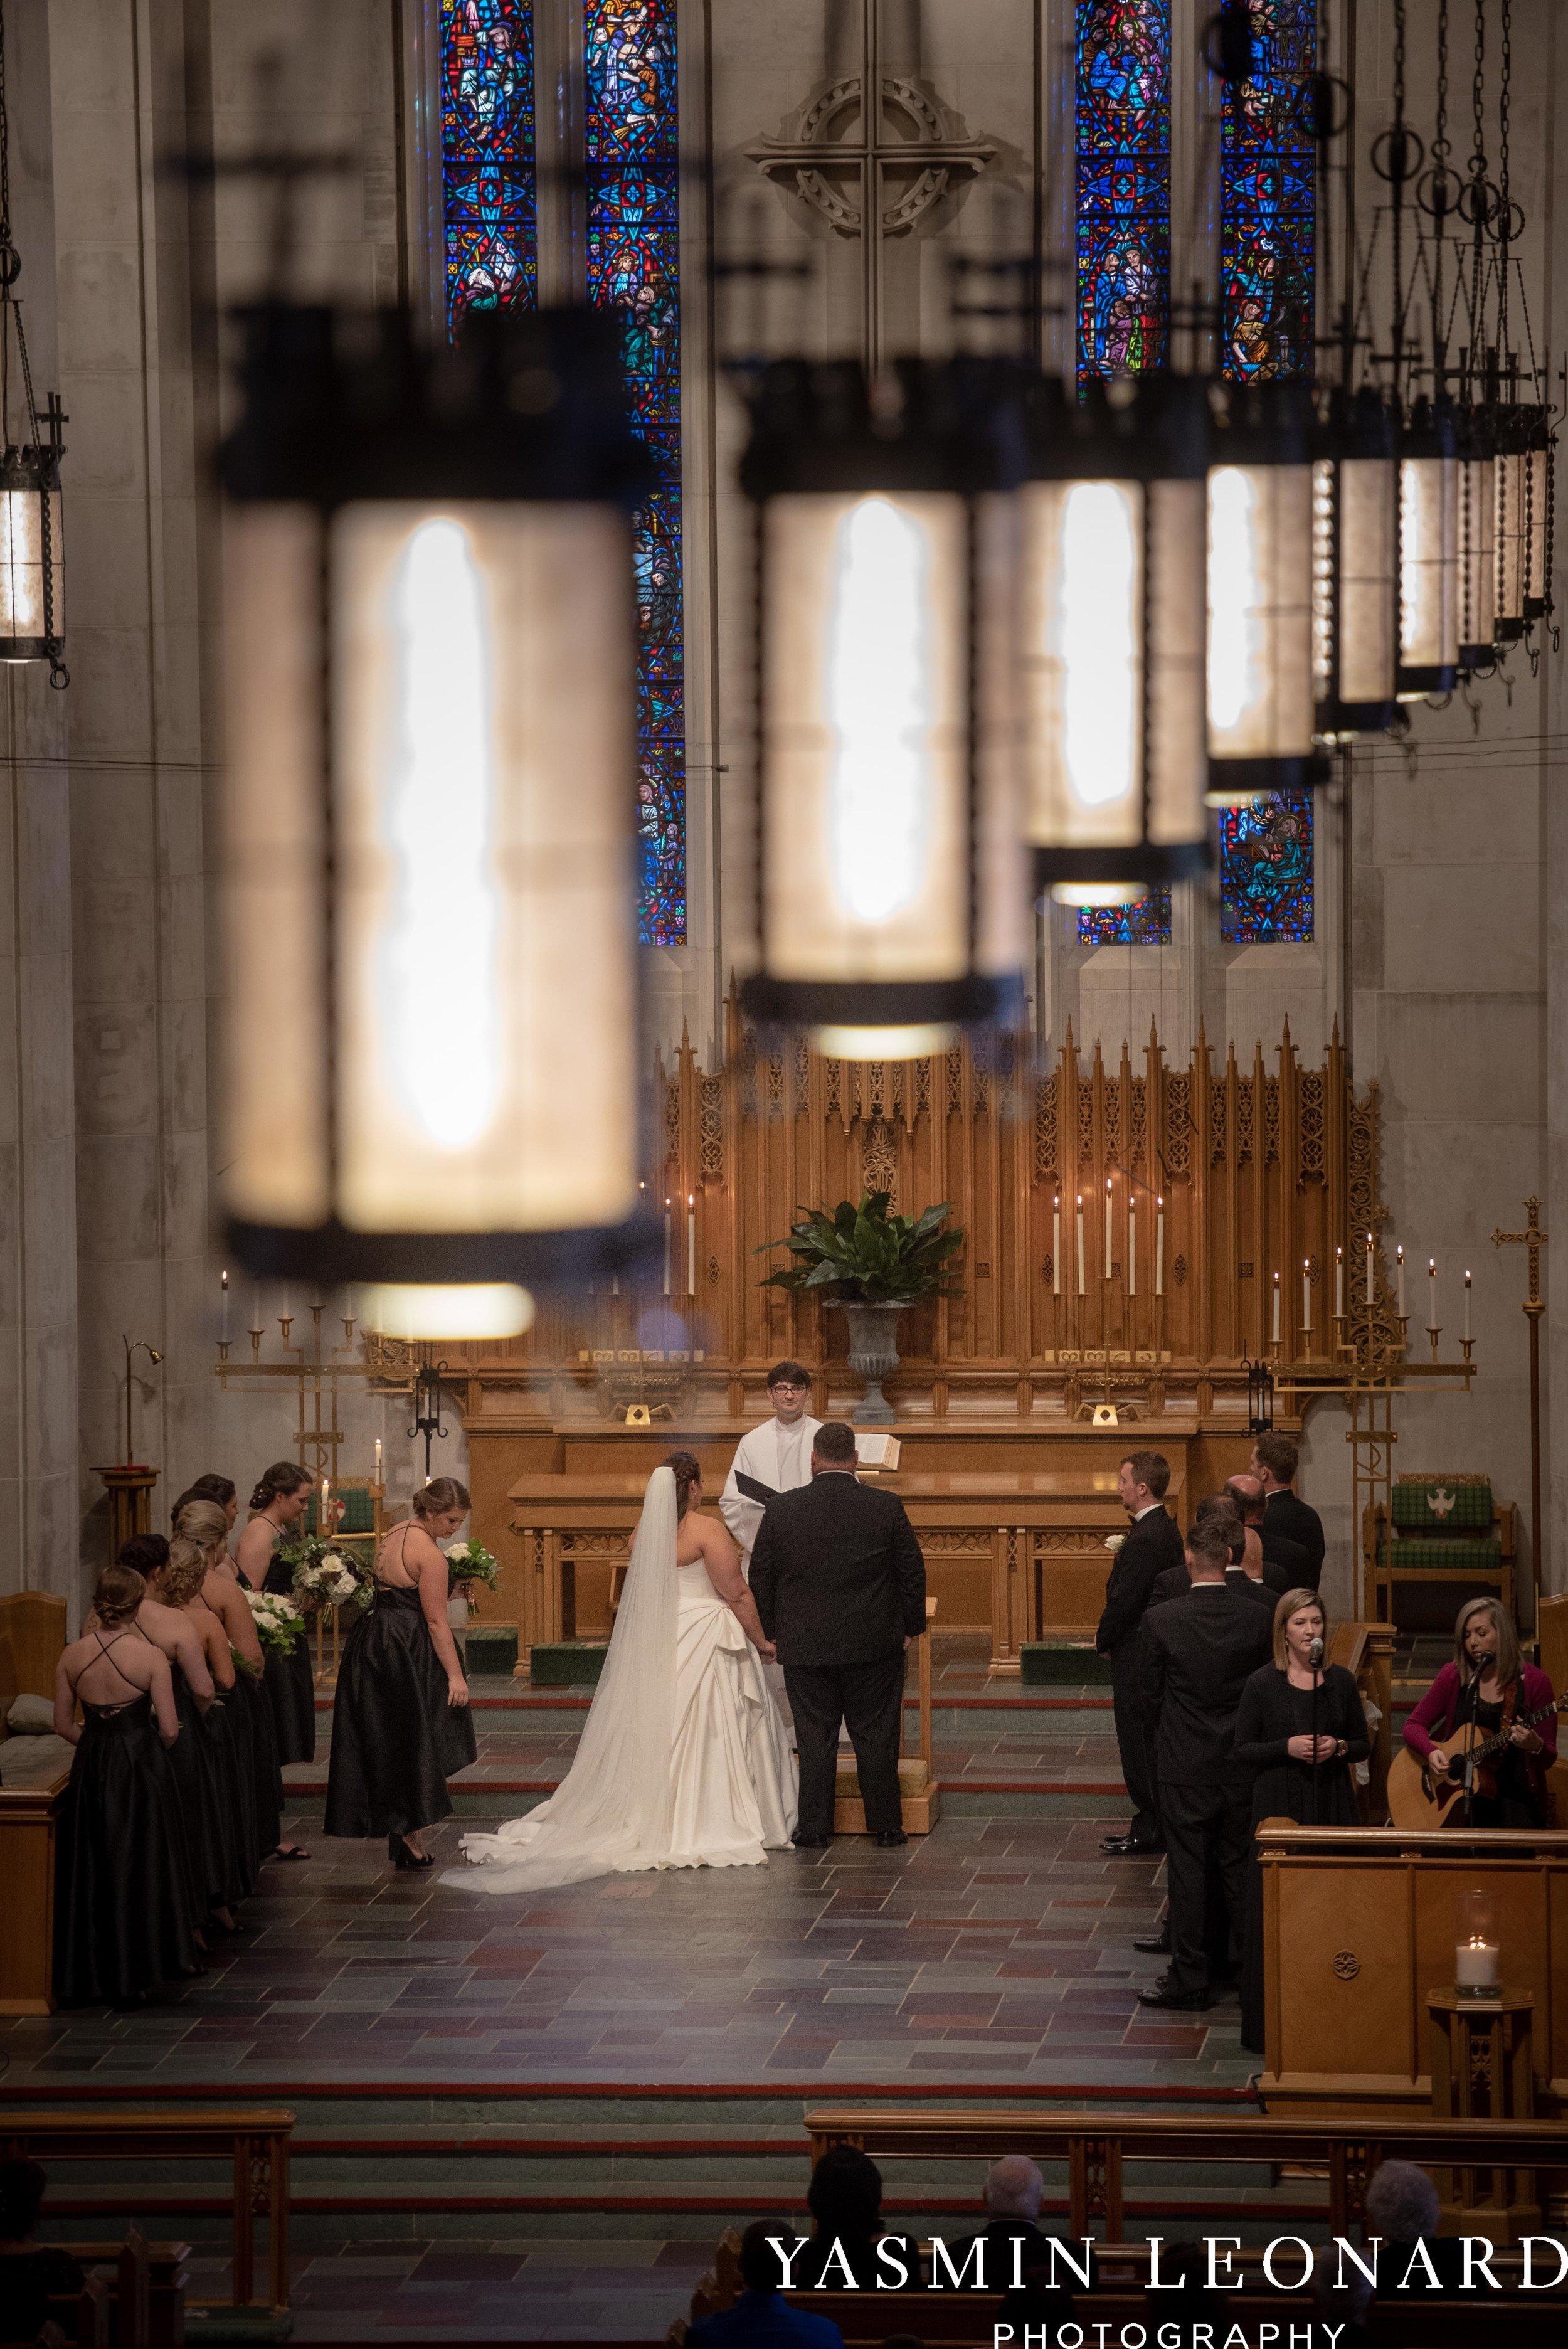 Wesley Memorial United Methodist Church - Old Homeplace Winery - High Point Weddings - High Point Wedding Photographer - NC Weddings - NC Barn Venue - Yasmin Leonard Photography-18.jpg